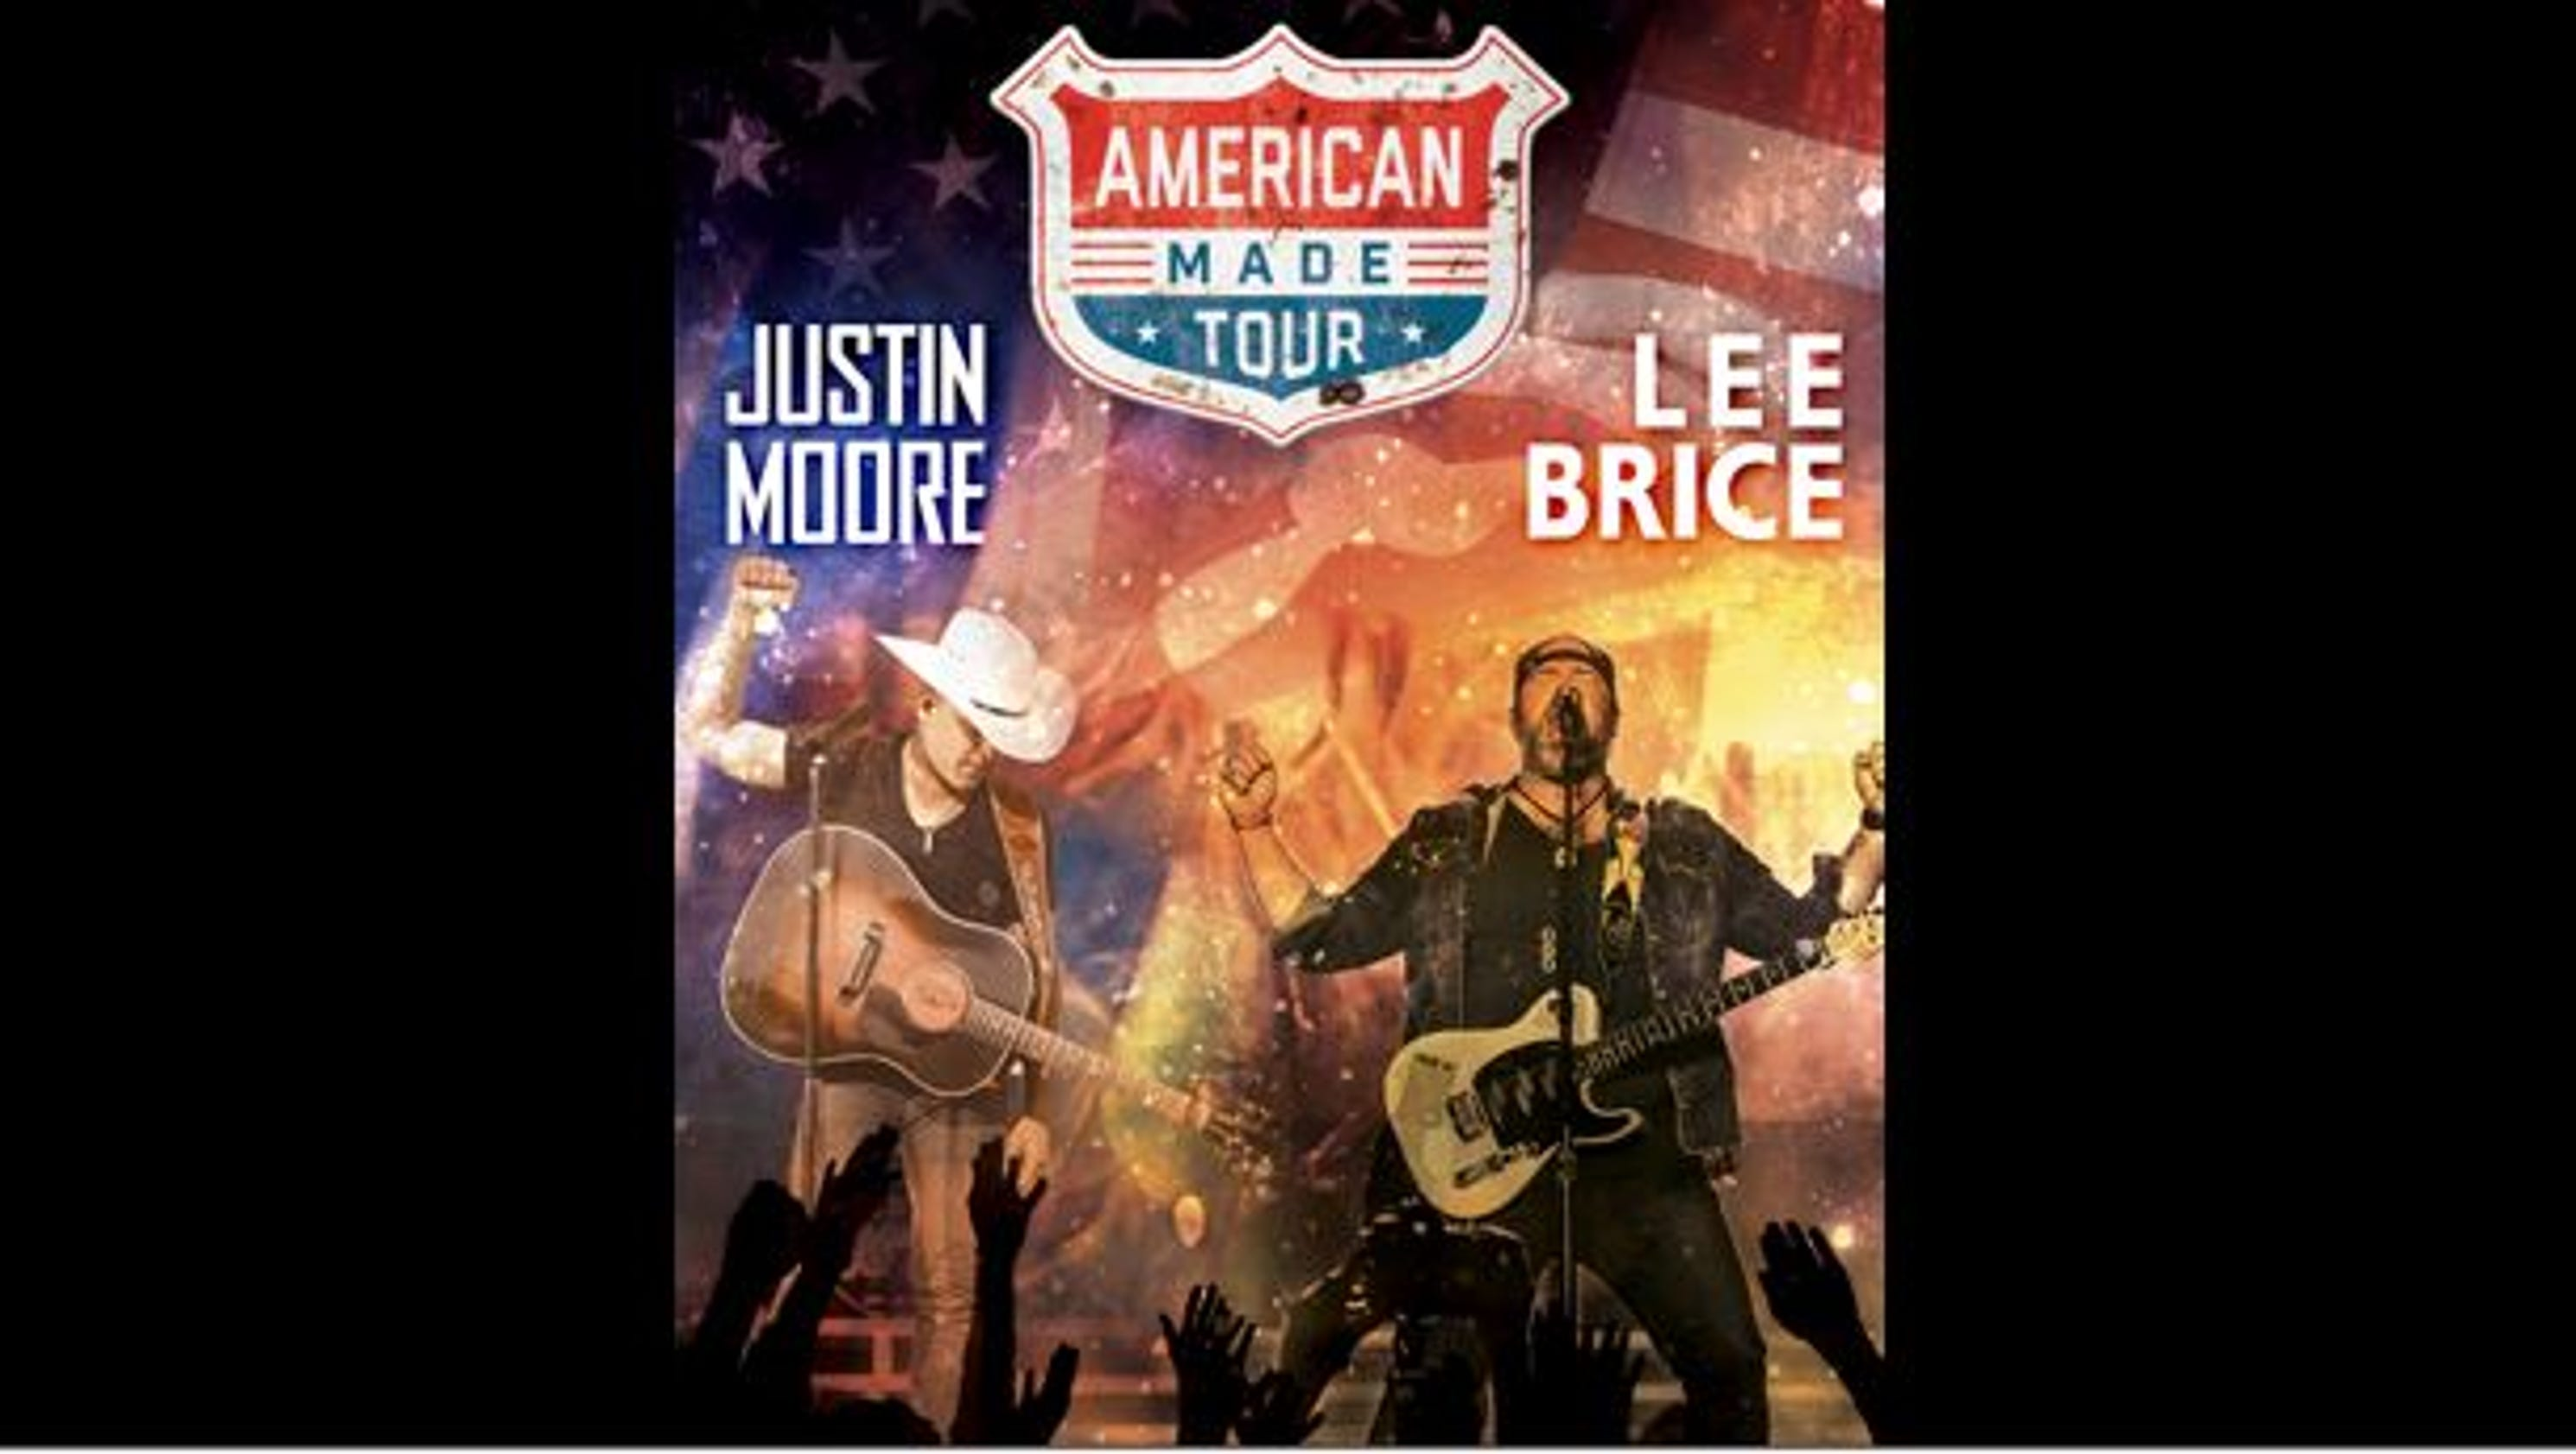 Lee Brice Concert Tour